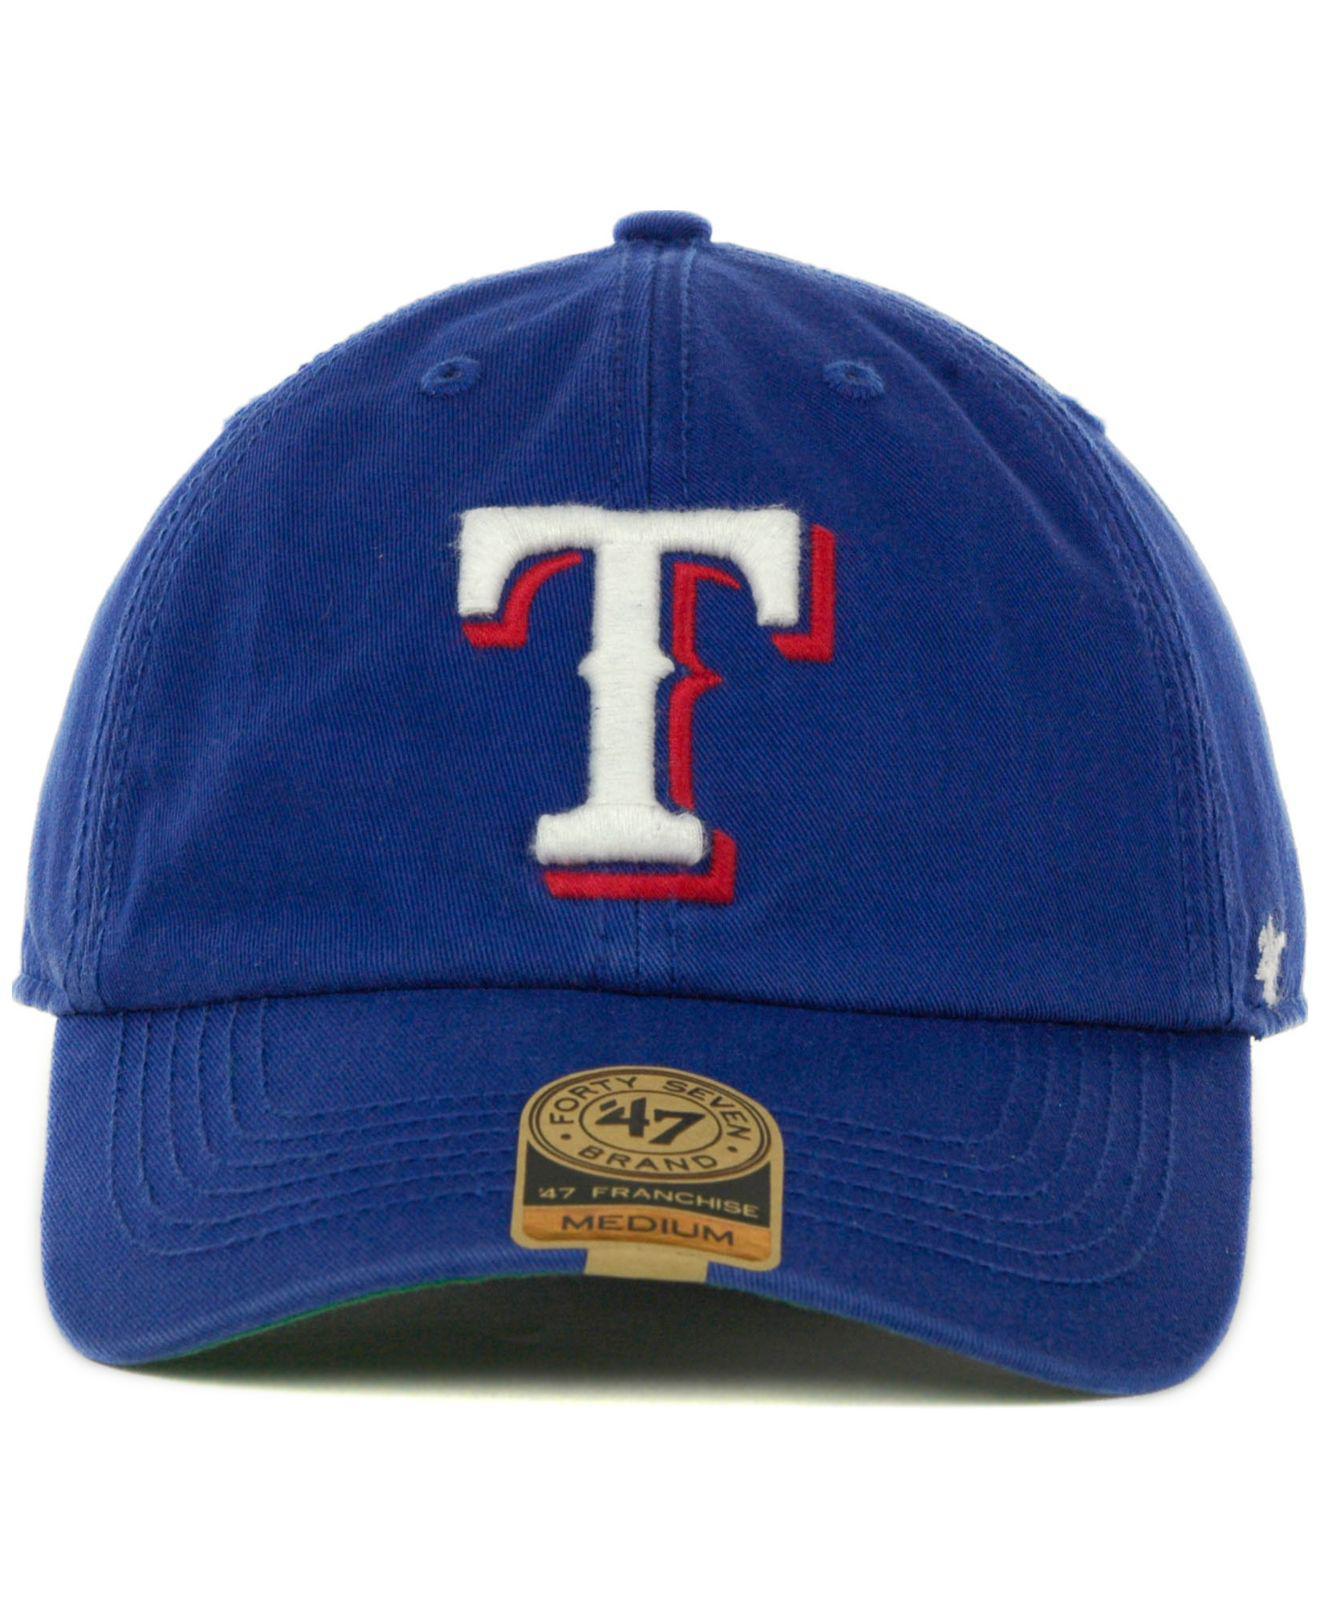 huge discount 2da6e ae59f ... promo code for lyst 47 brand texas rangers franchise cap in green for  men 3f007 5d46c